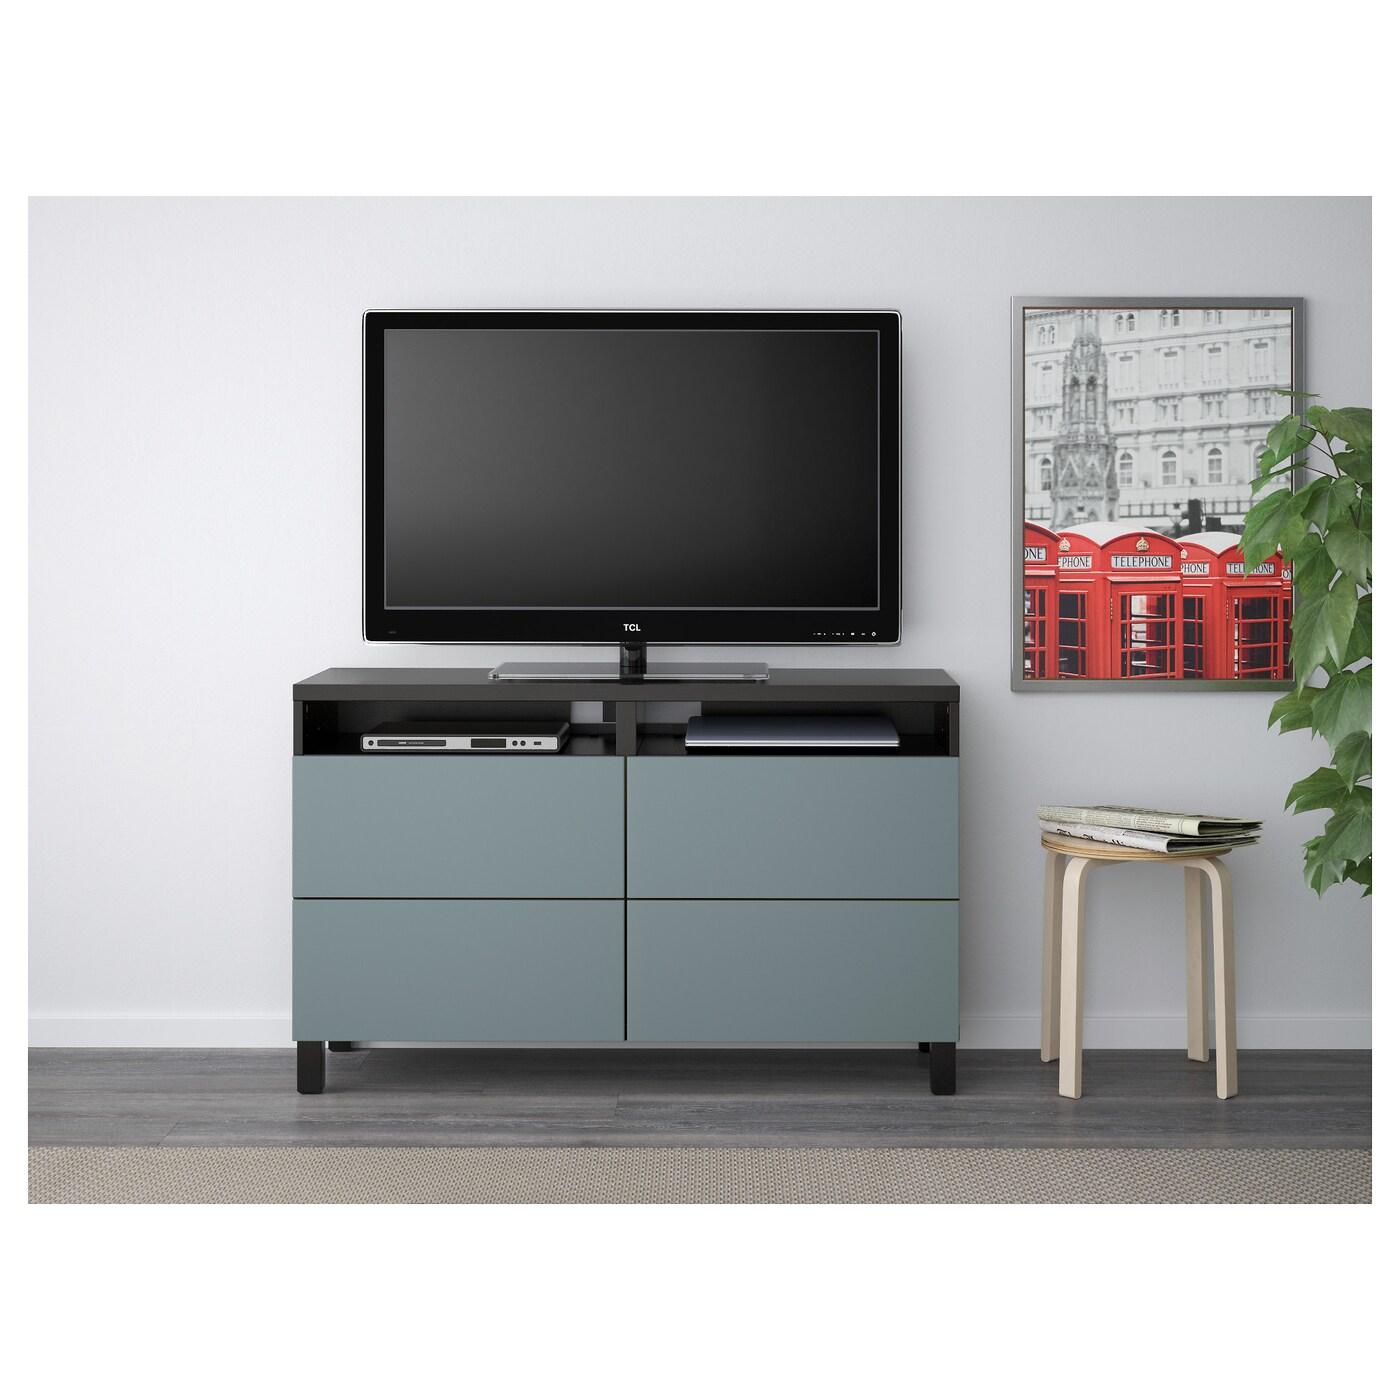 Best Tv Bench With Drawers Black Brown Valviken Grey Turquoise 120x40x74 Cm Ikea